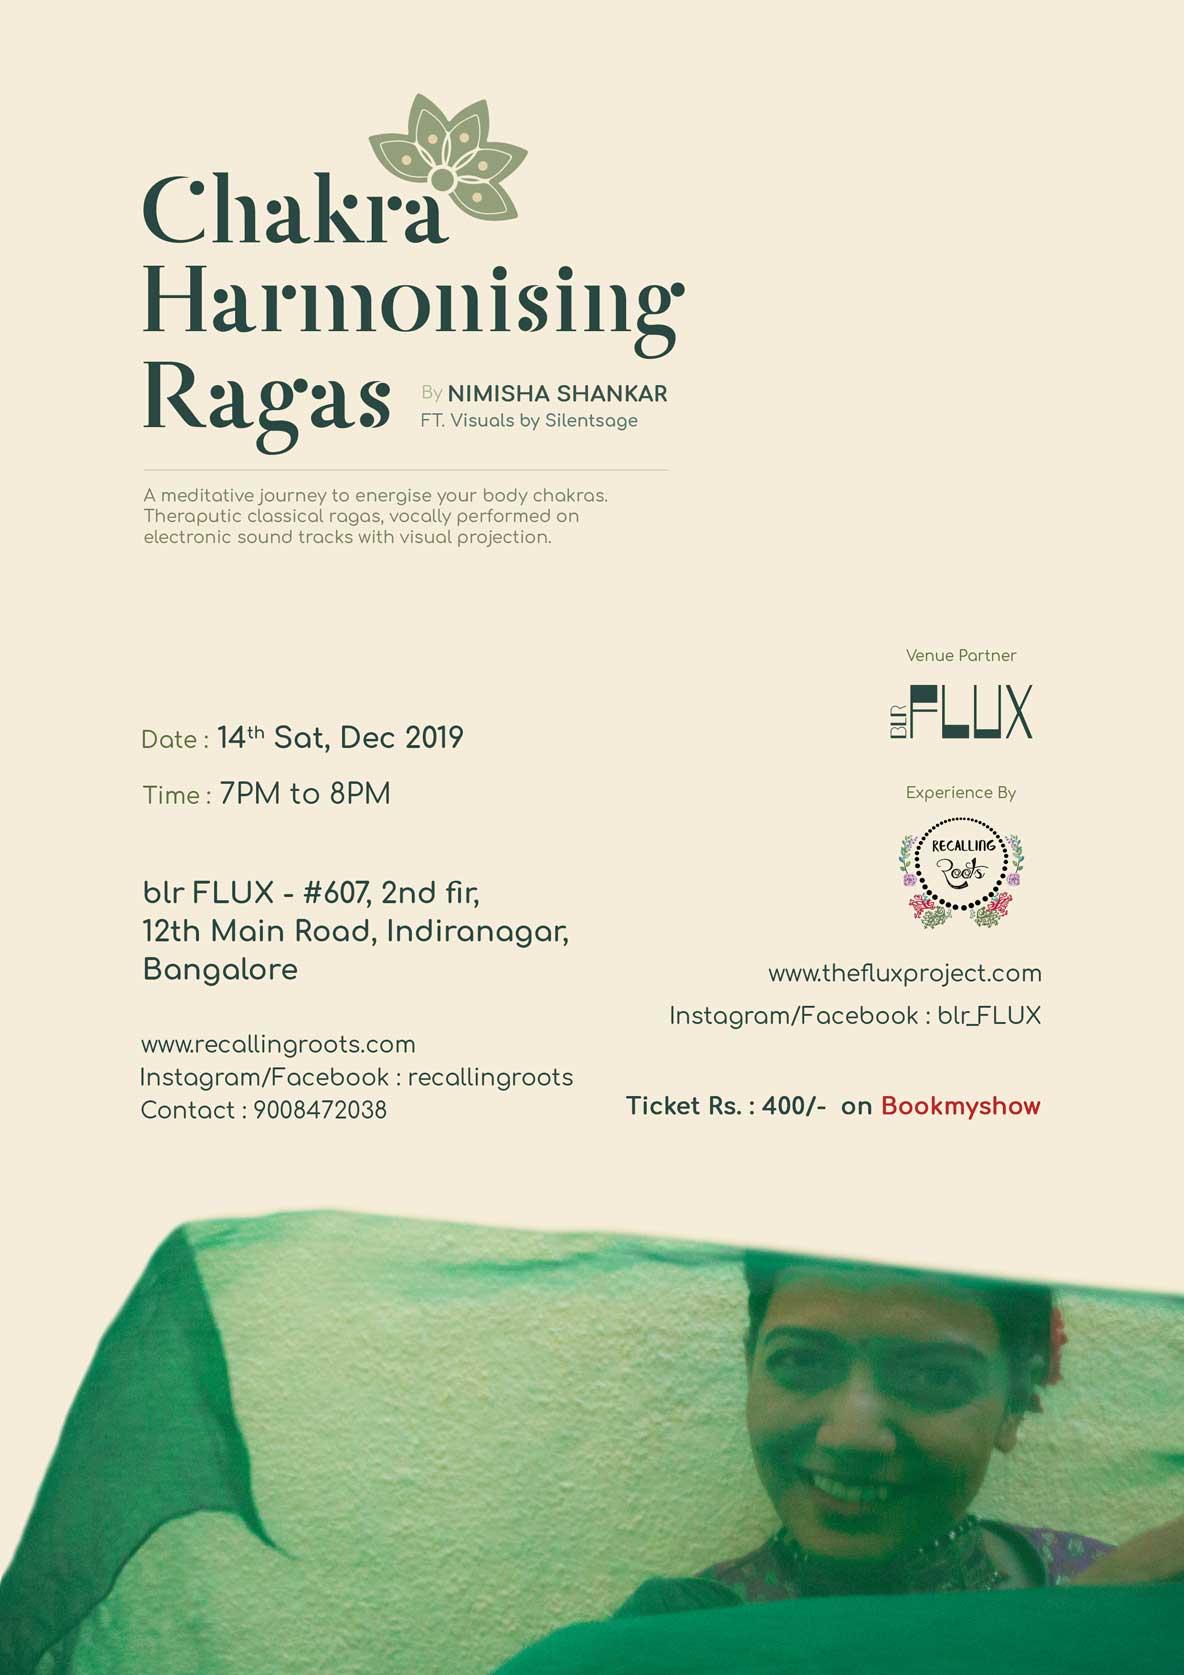 Events in Bangalore at FLUX: Music Performance by Nimisha Shankar - Chakra Harmonizing Ragas